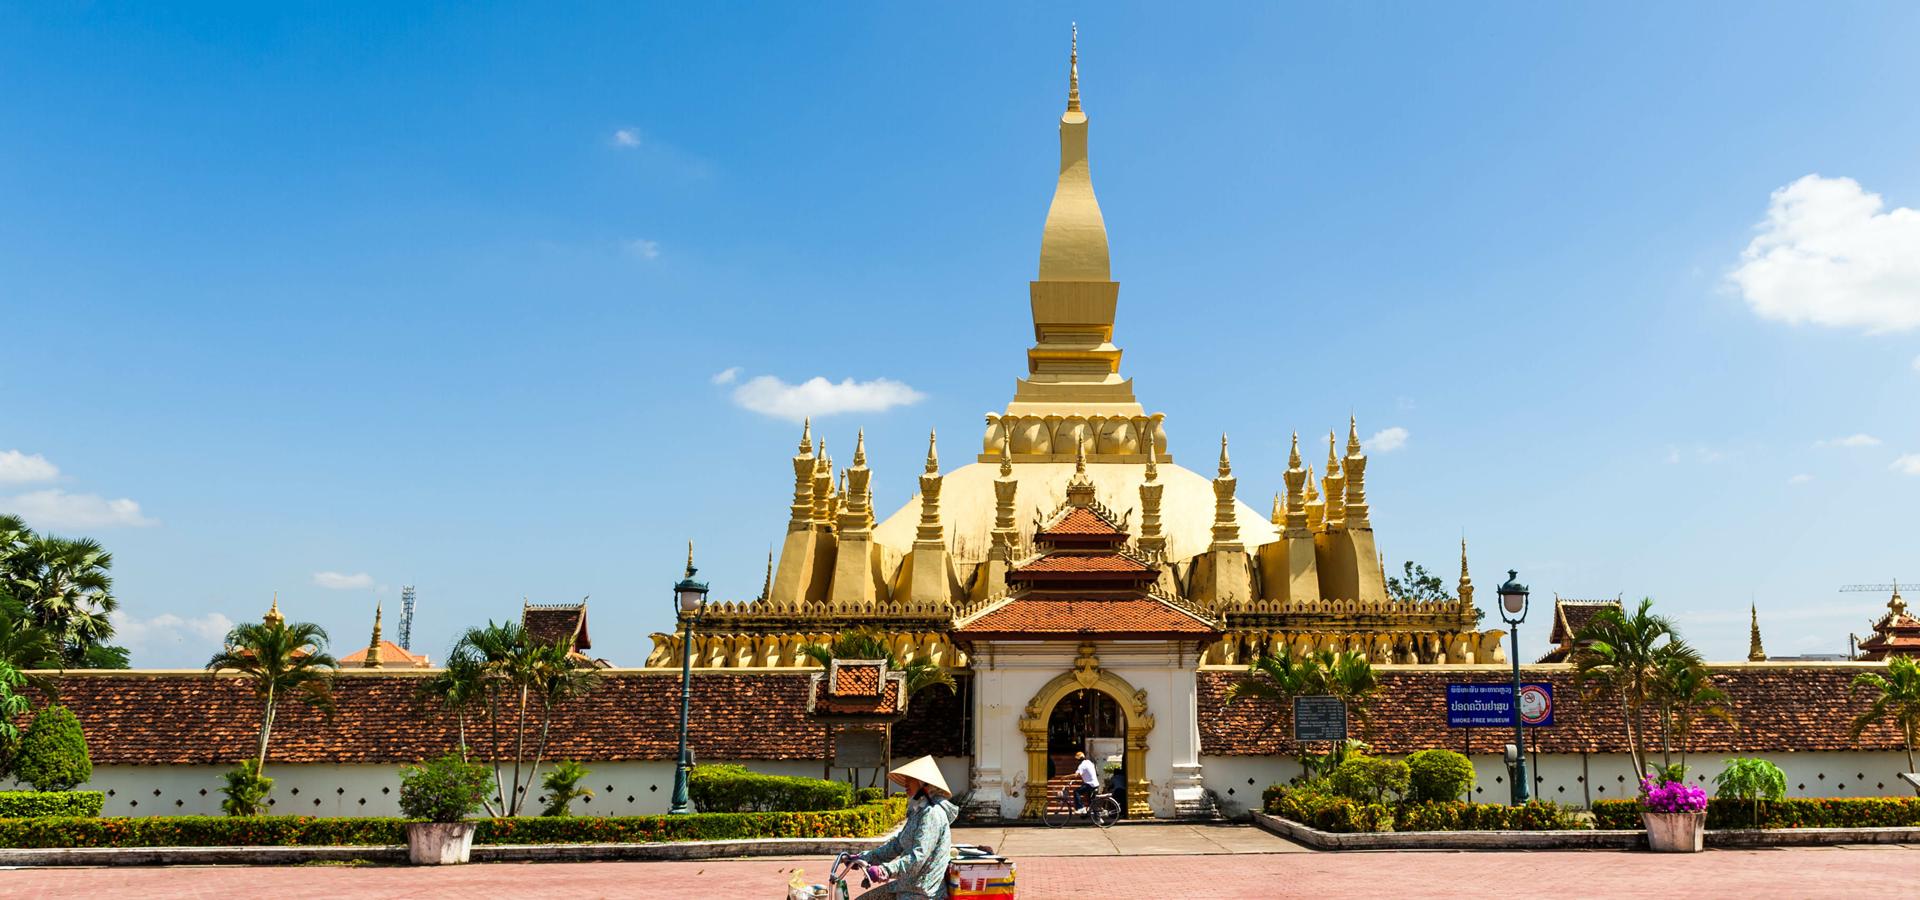 <b>Vientiane, Laos</b>